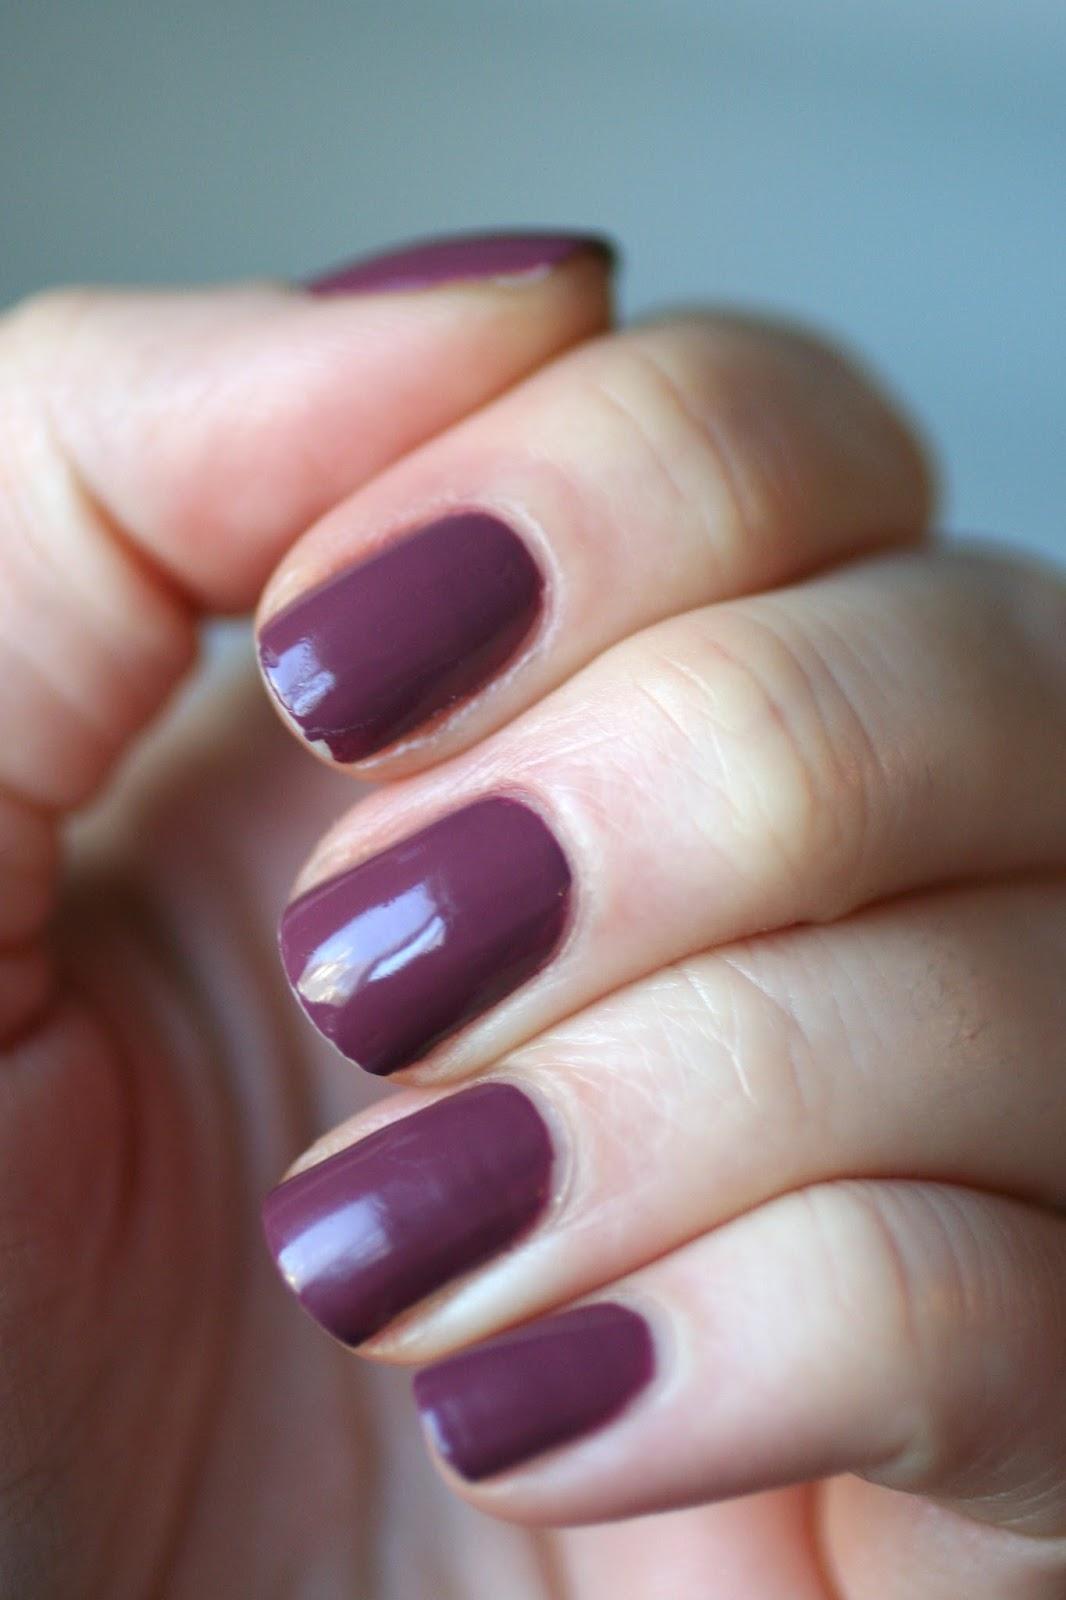 Essie Gel Setter : Top Coat Wear Test & Review | Essie Envy